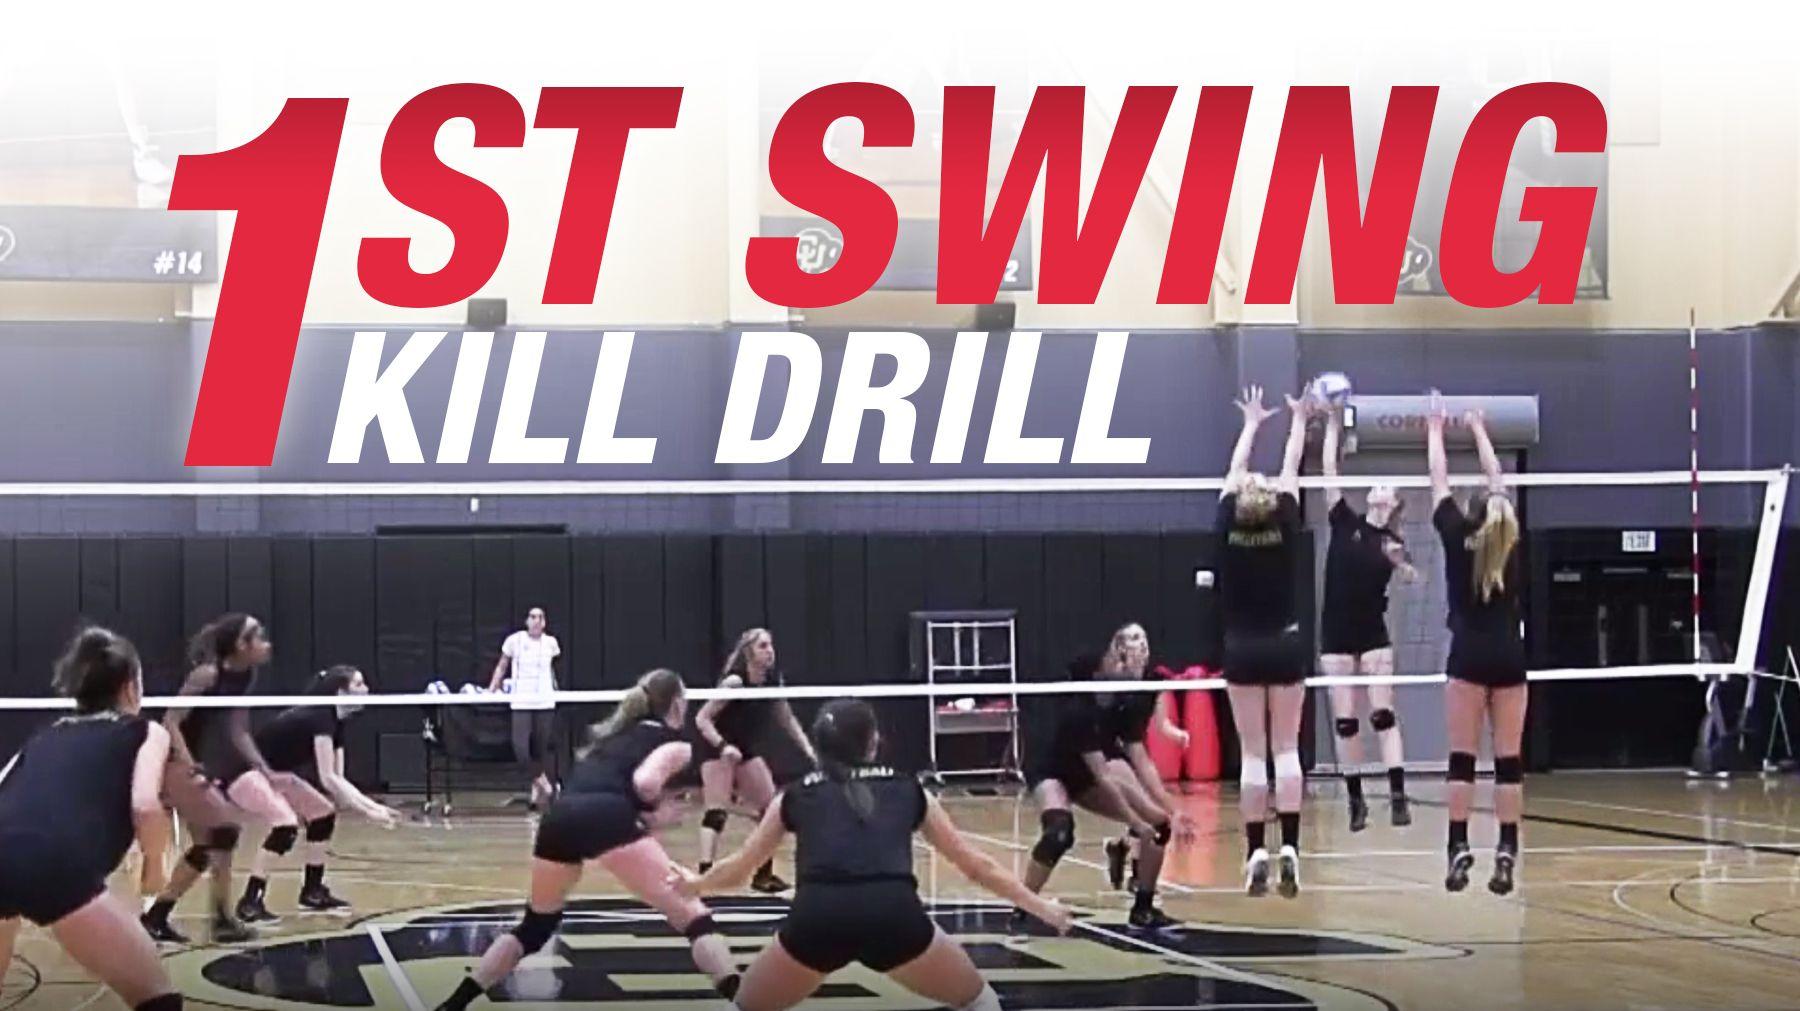 First Swing Kill Drill The Art Of Coaching Volleyball Coaching Volleyball Volleyball Drills Volleyball Training